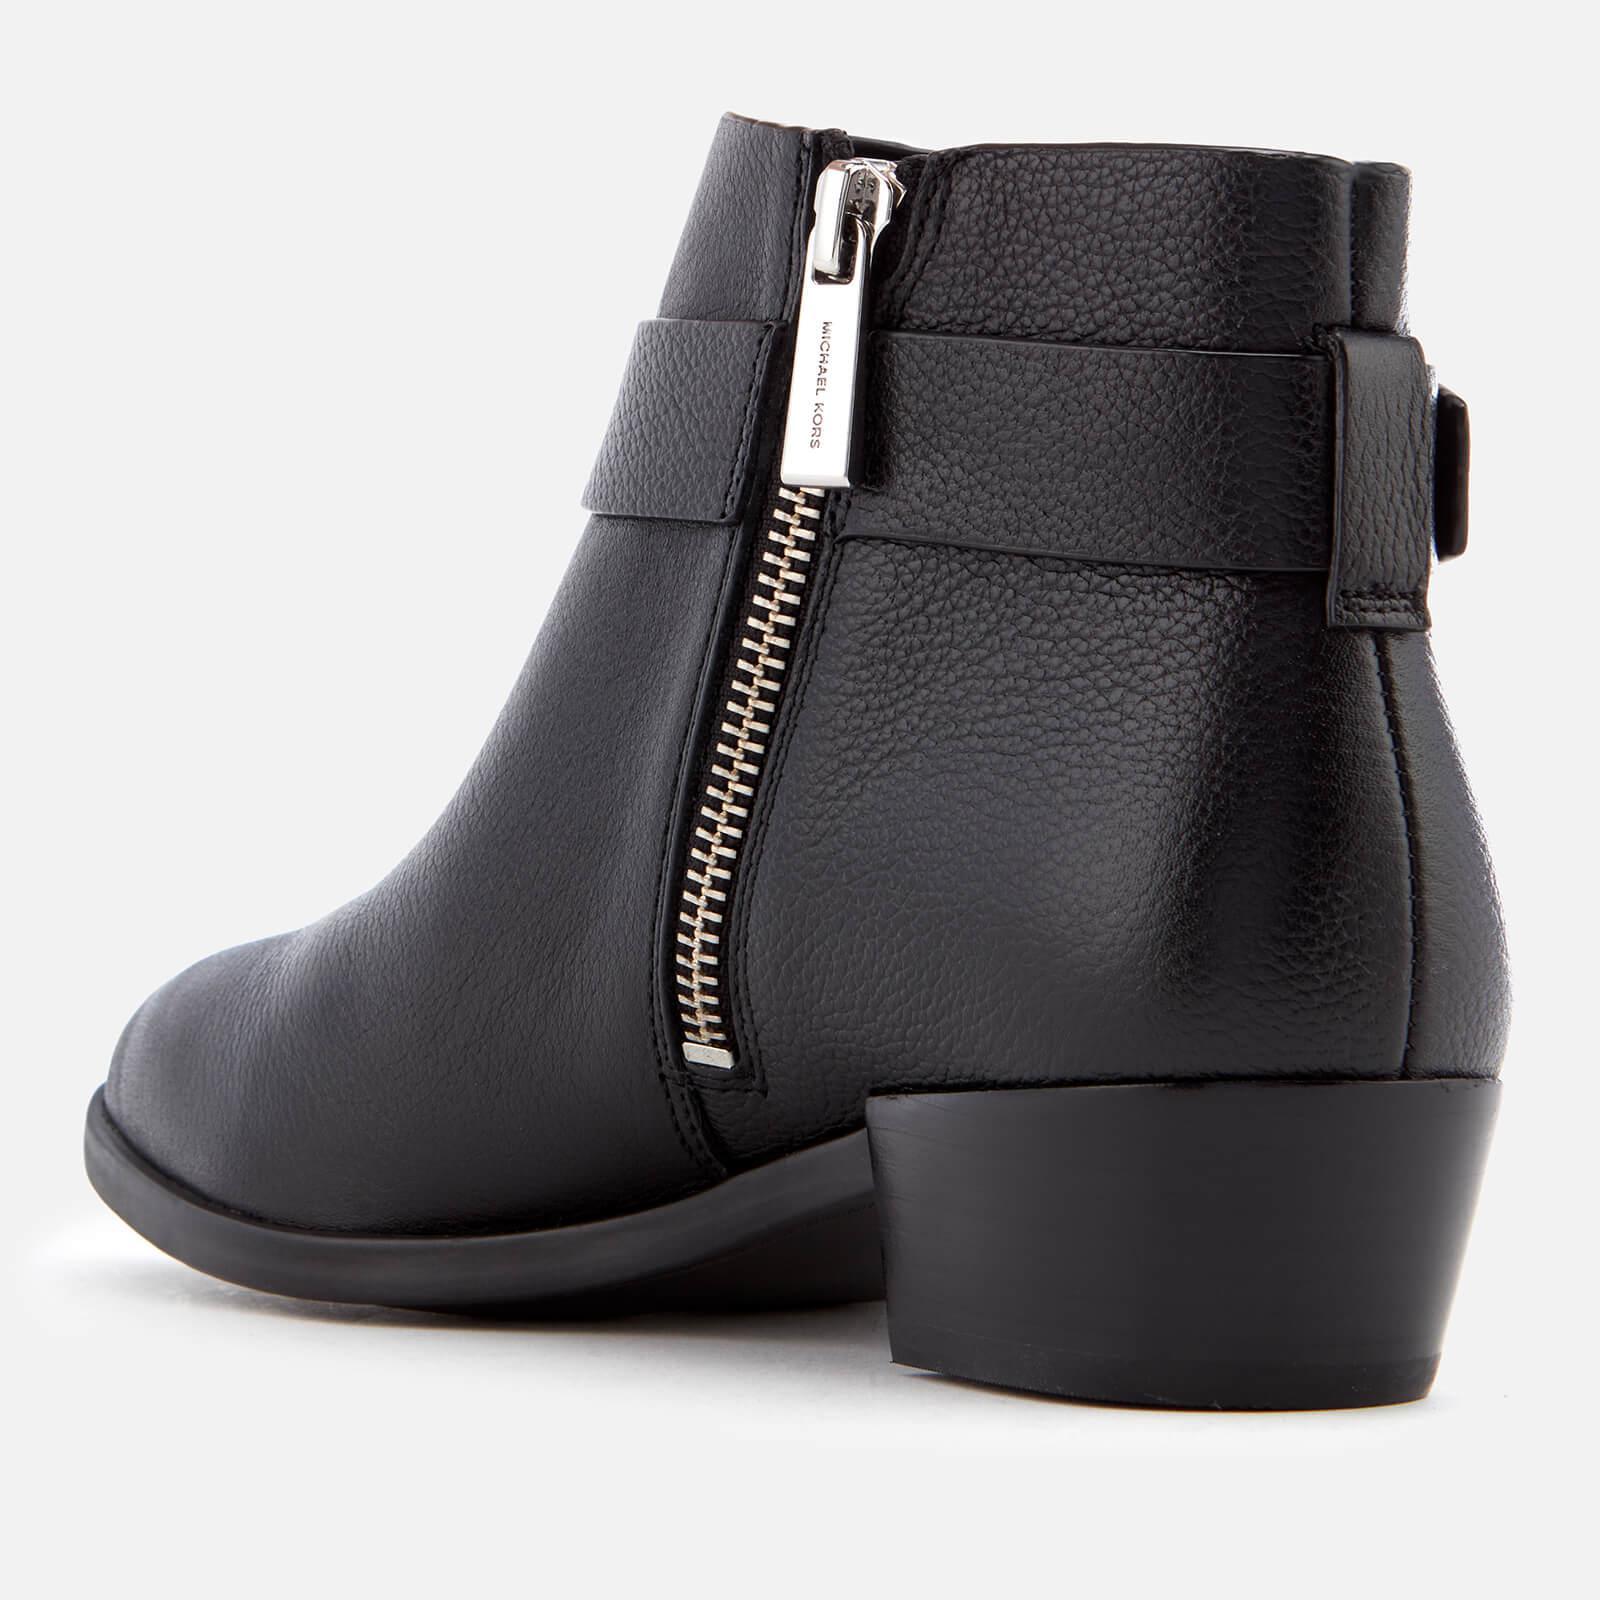 89e180a7b2dd MICHAEL Michael Kors - Black Harland Ankle Boots - Lyst. View fullscreen